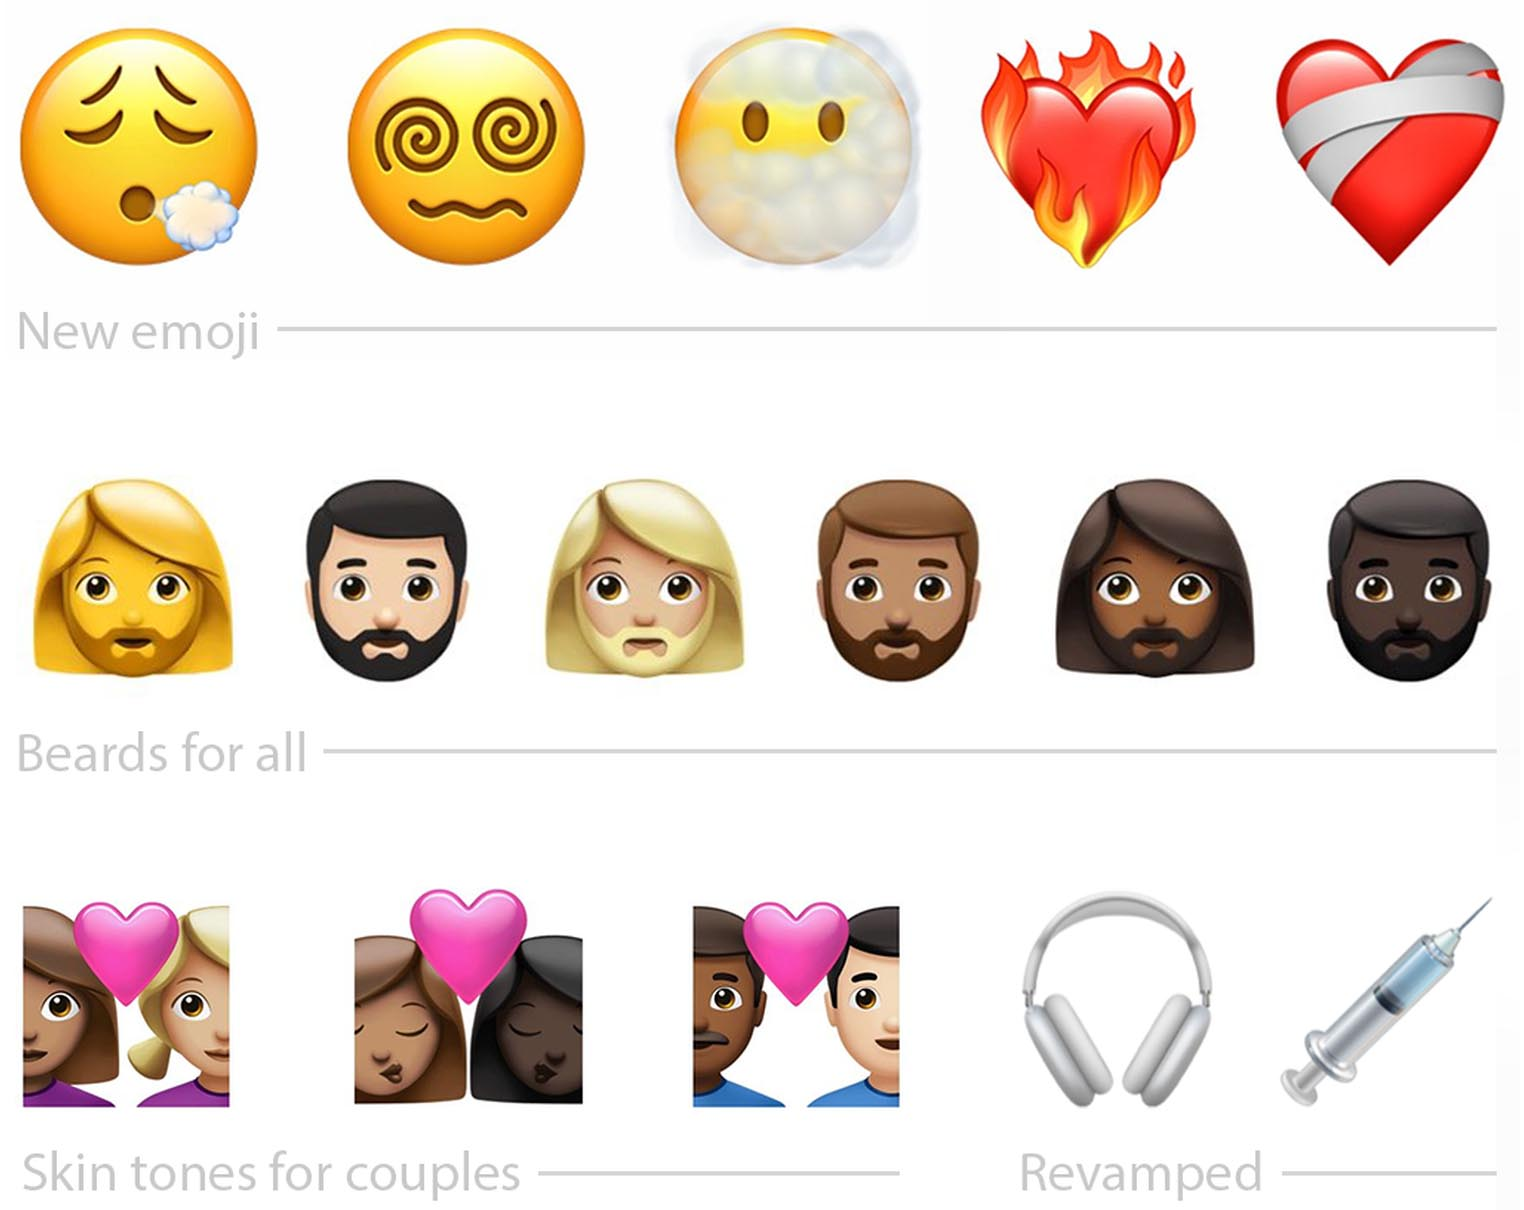 Emojis 2021 iOS 14.5